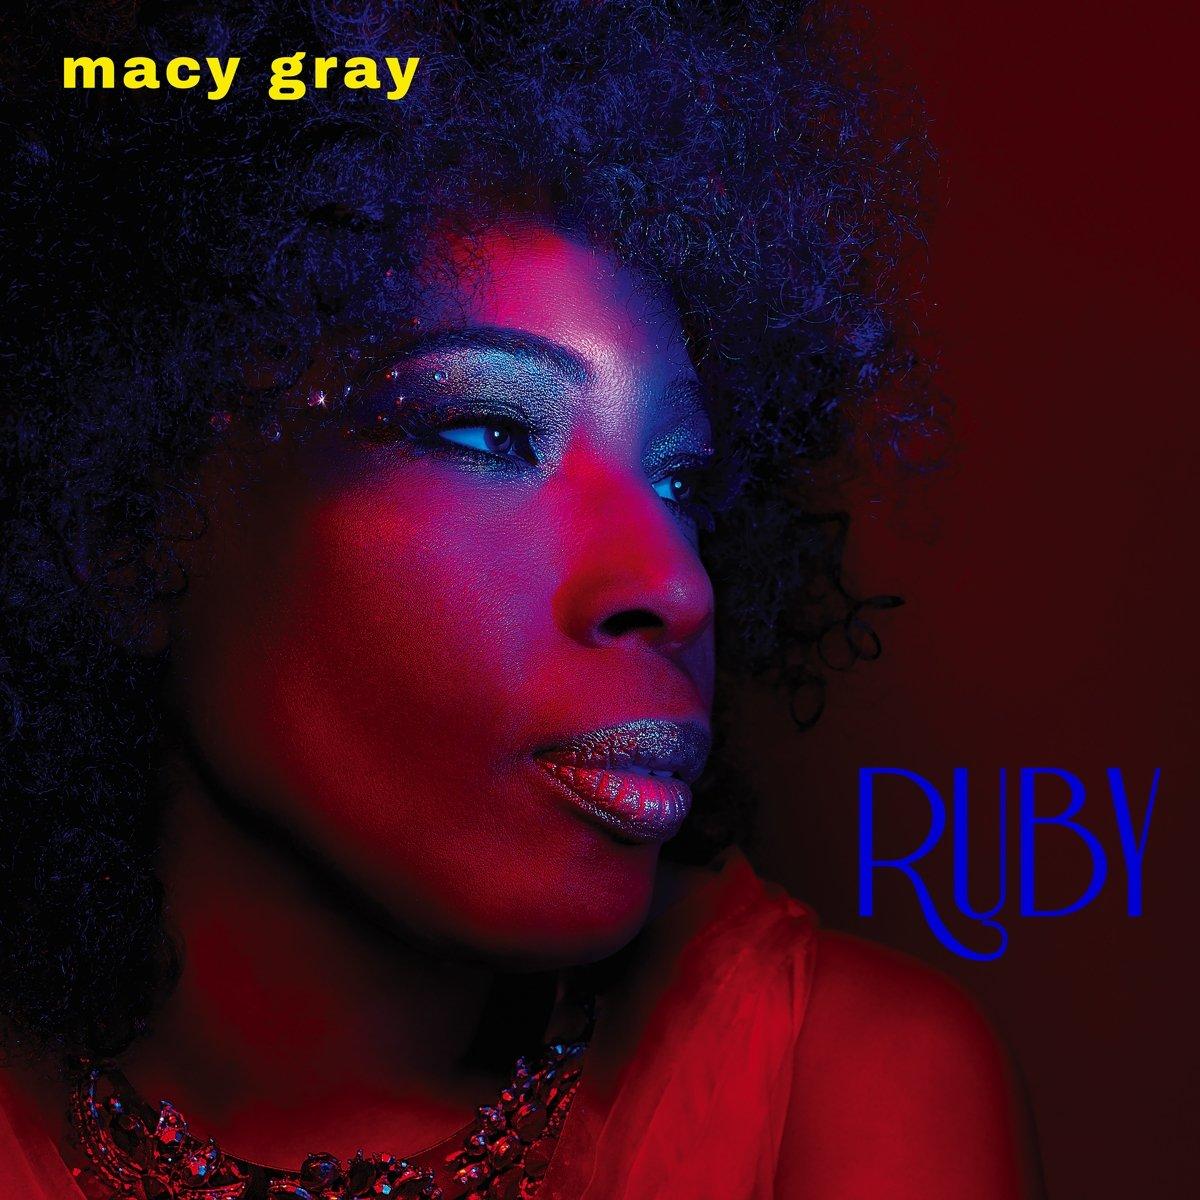 Macy Gray – Ruby (2018) [FLAC]